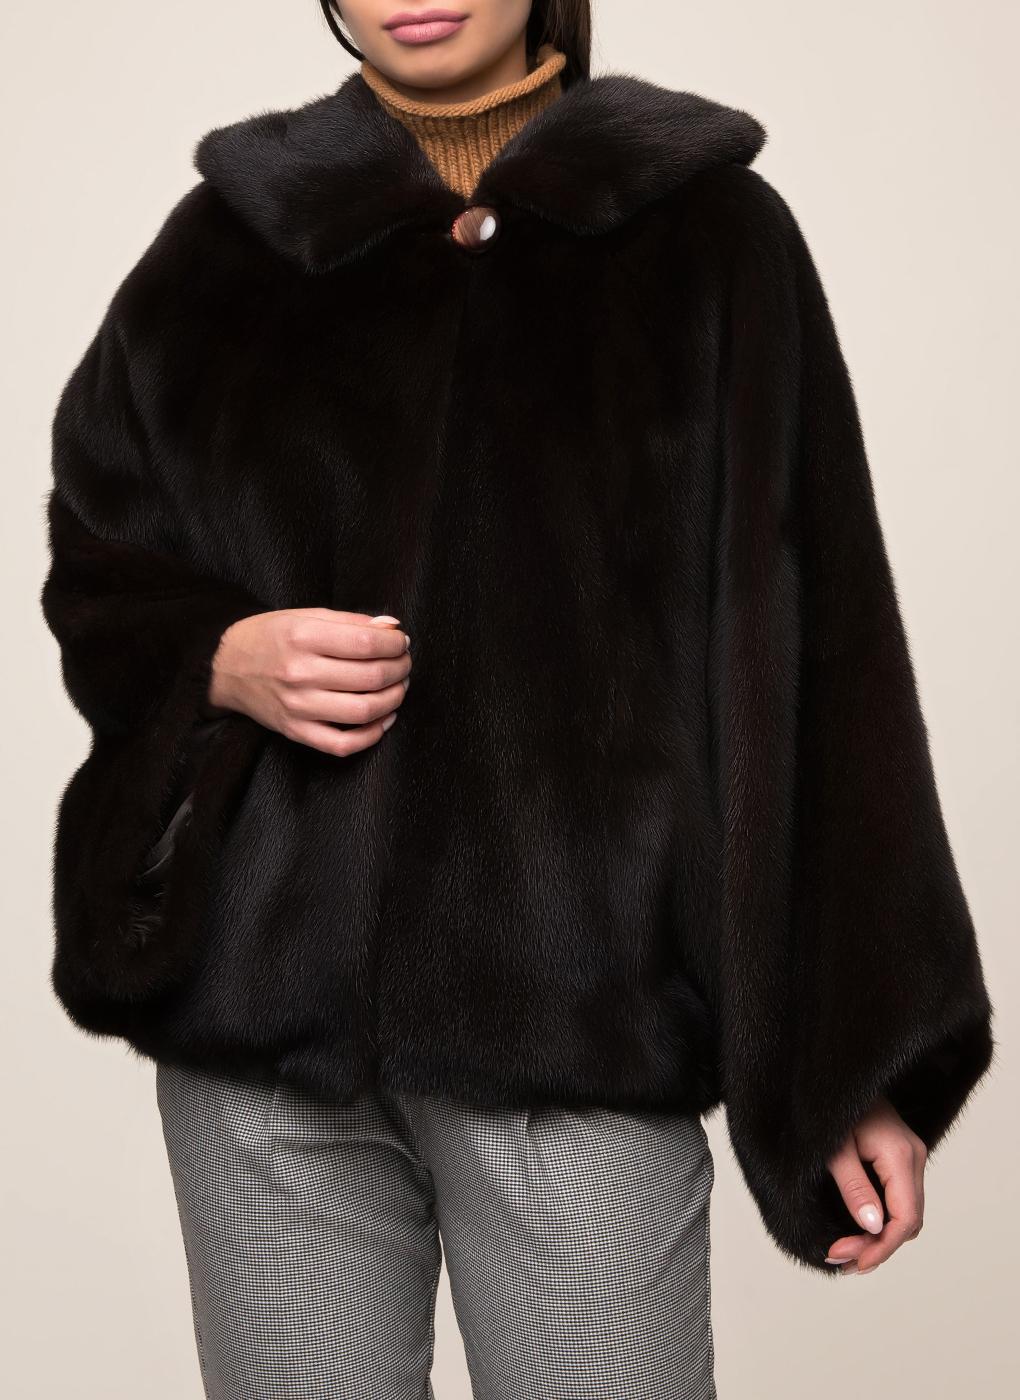 Норковая куртка Дея 01, SCANDZA фото